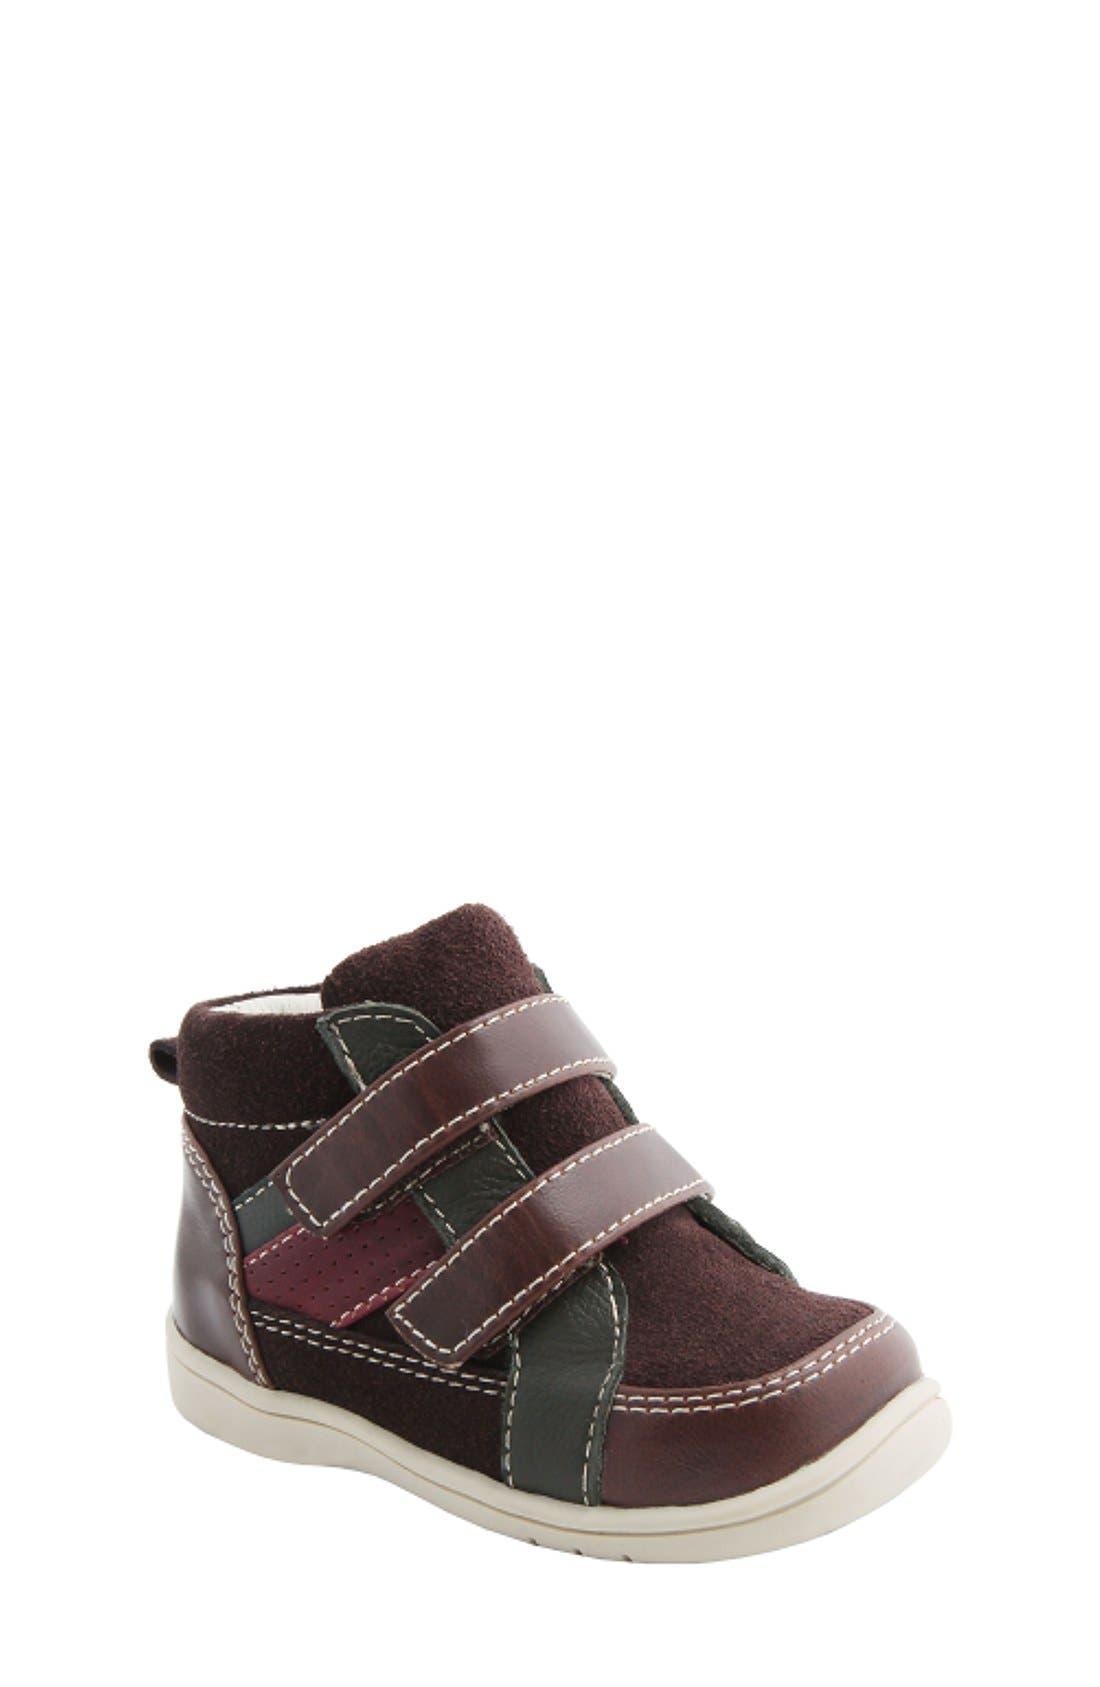 Nina 'Cairo' High Top Sneaker,                         Main,                         color, Brown Suede